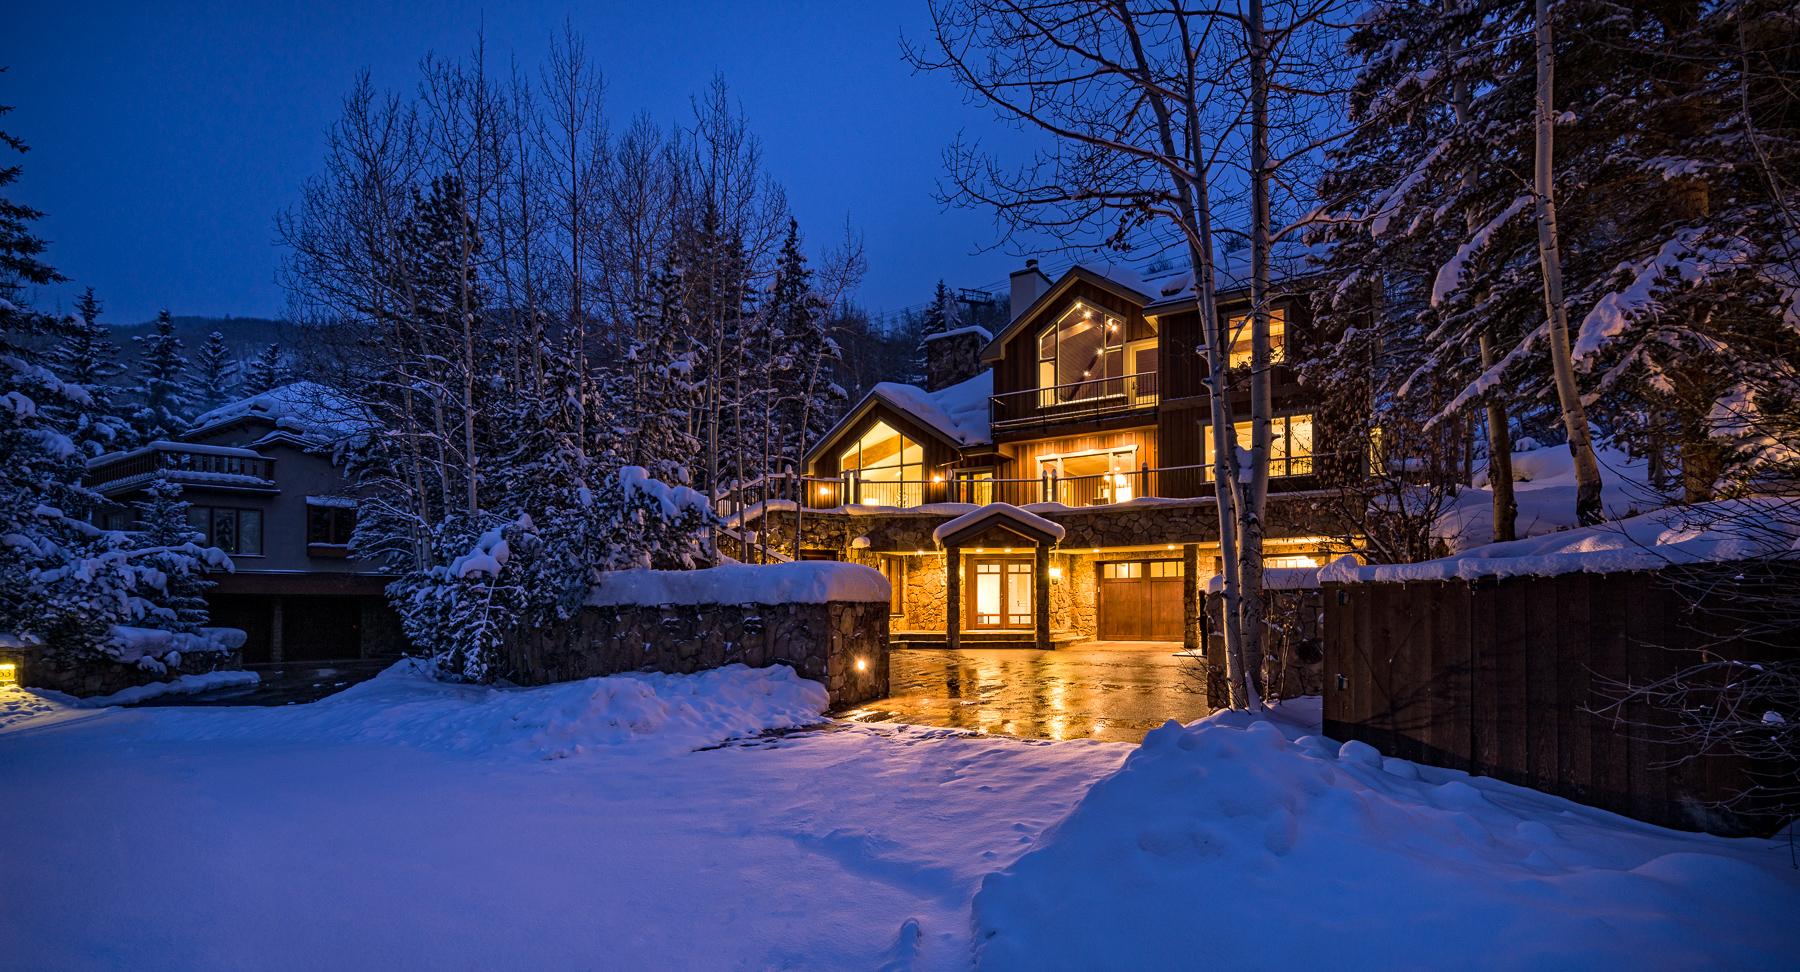 独户住宅 为 销售 在 Ski in/Ski out Residence in Beaver Creek 65 Elk Track Ct Beaver Creek, Beaver Creek, 科罗拉多州 81620 美国